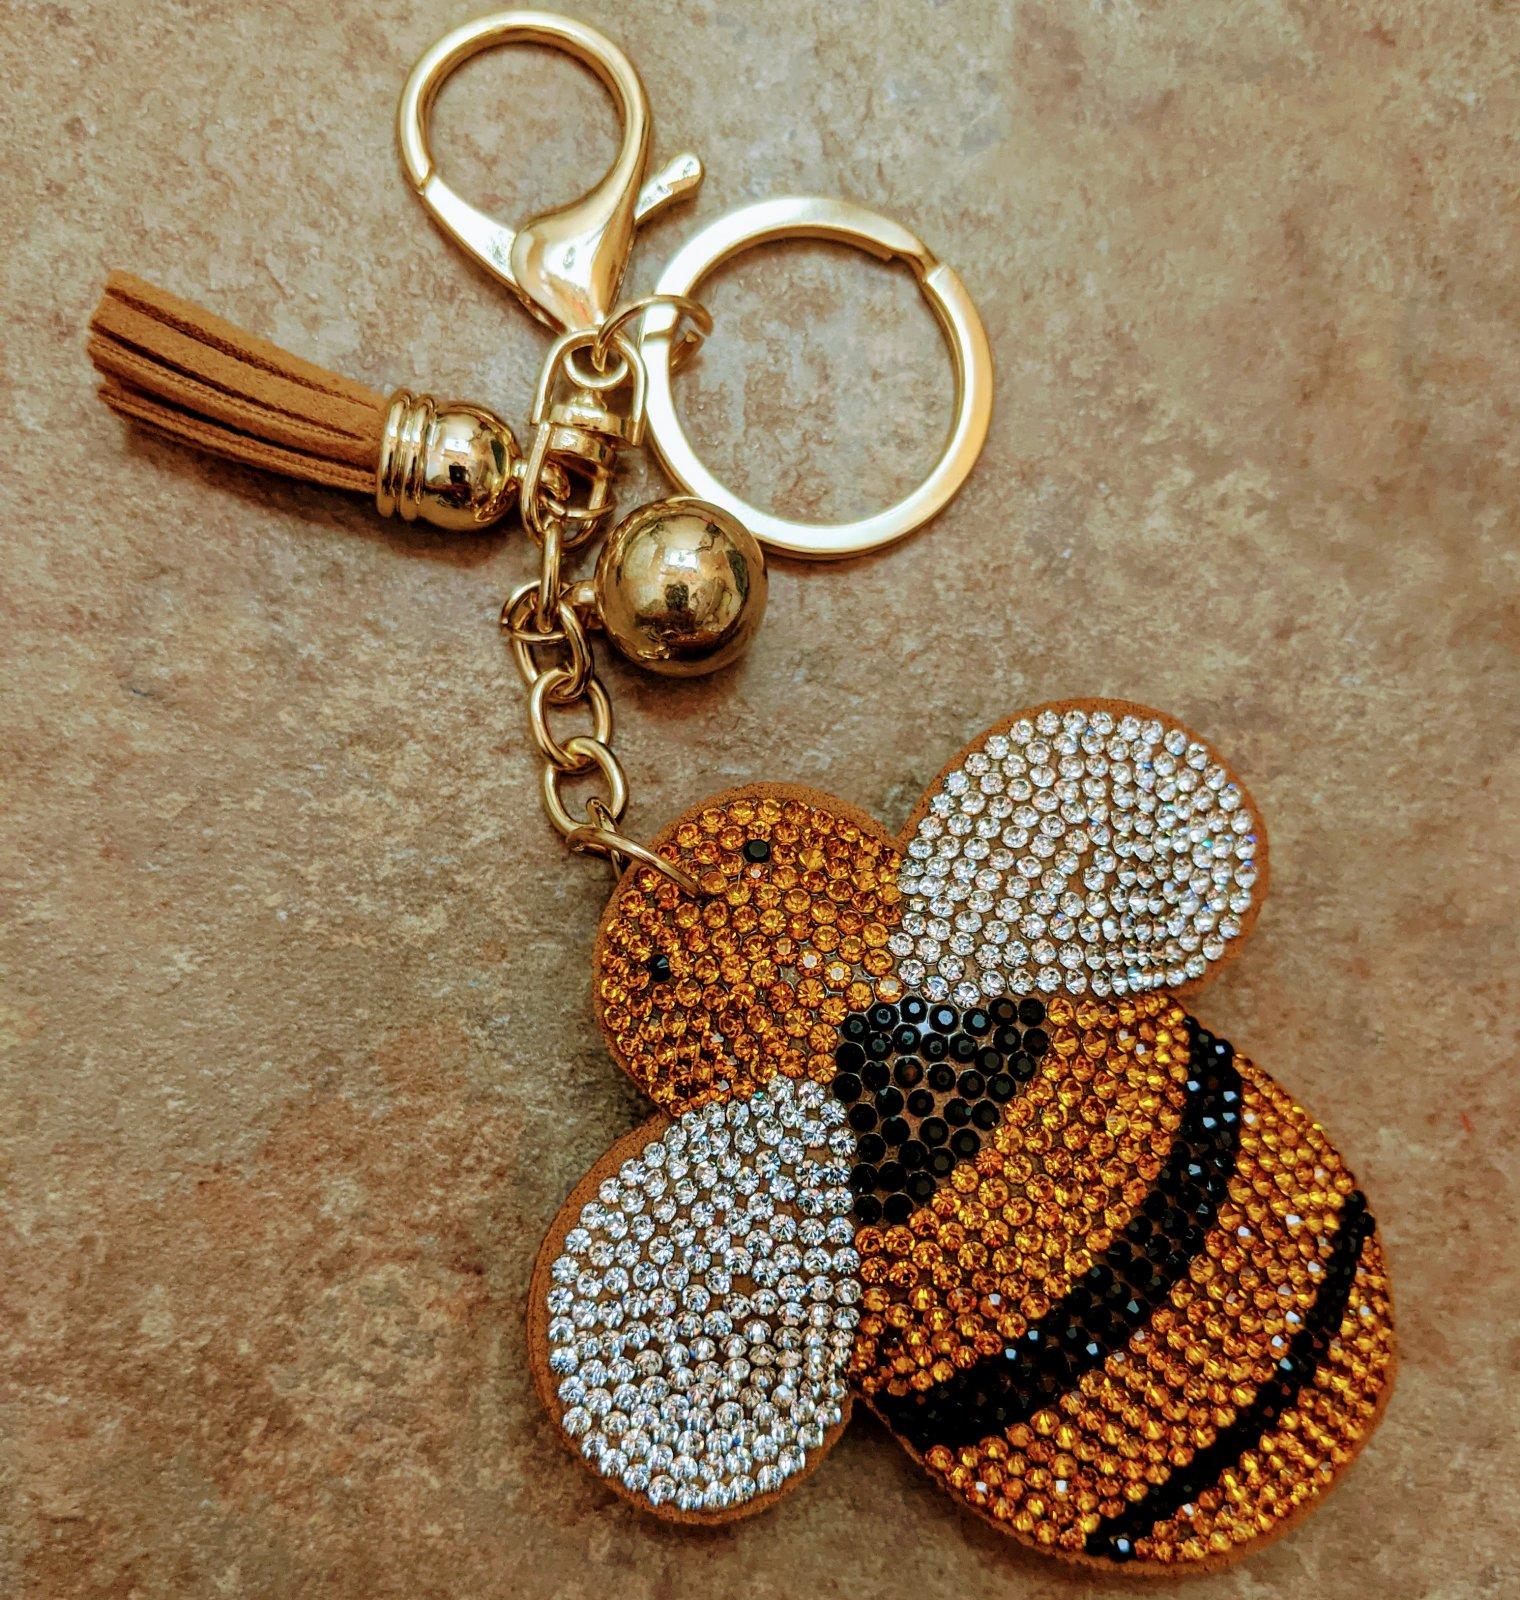 Rhinestone Bee Key Chain